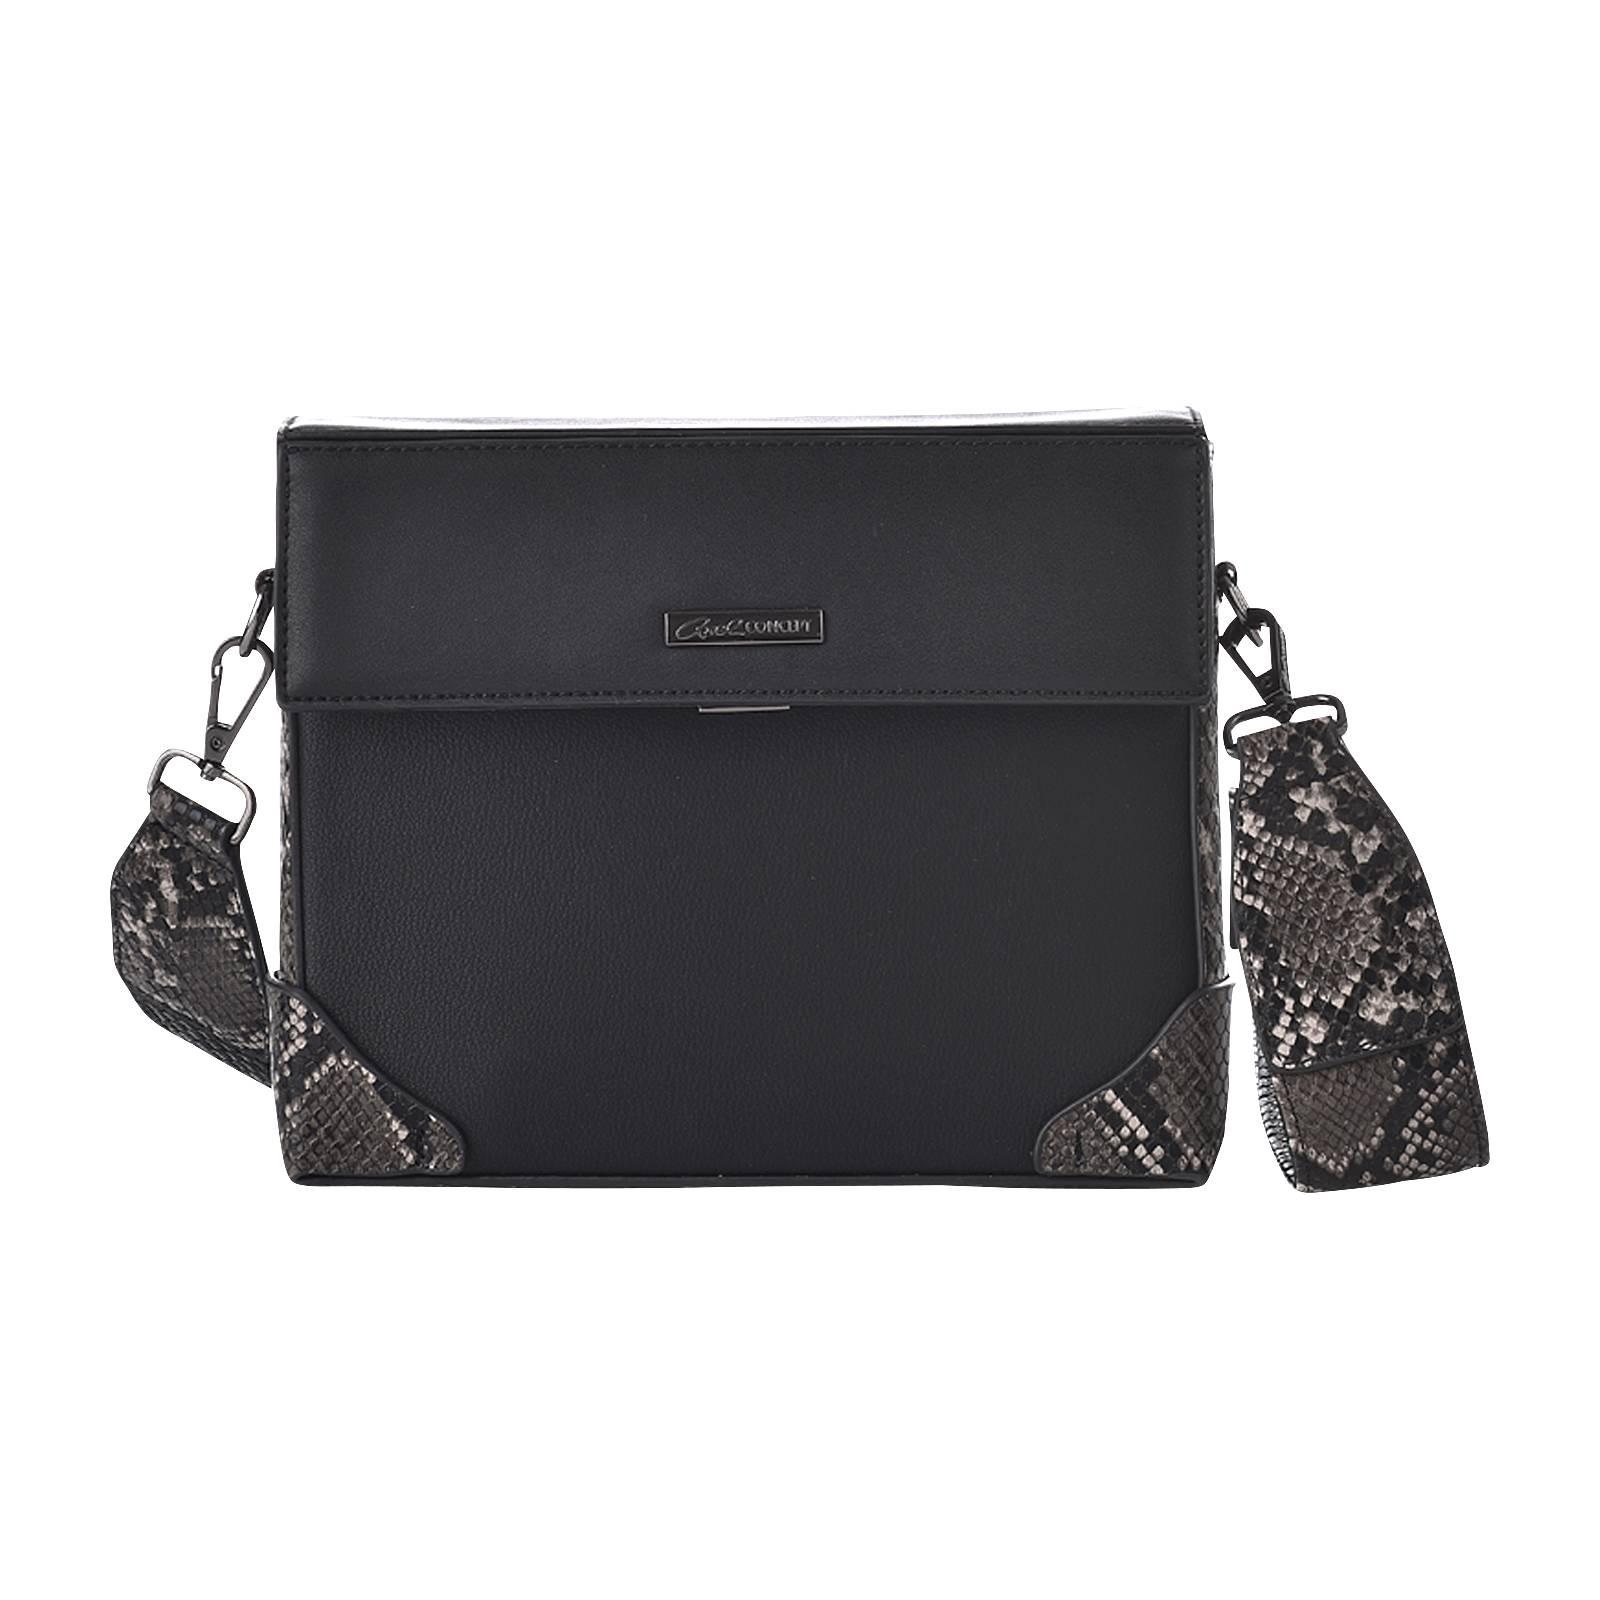 Yoselin - Γυναικεία τσάντα Axel Concept από δερμα print συνθετικο ... 94bbf545da1